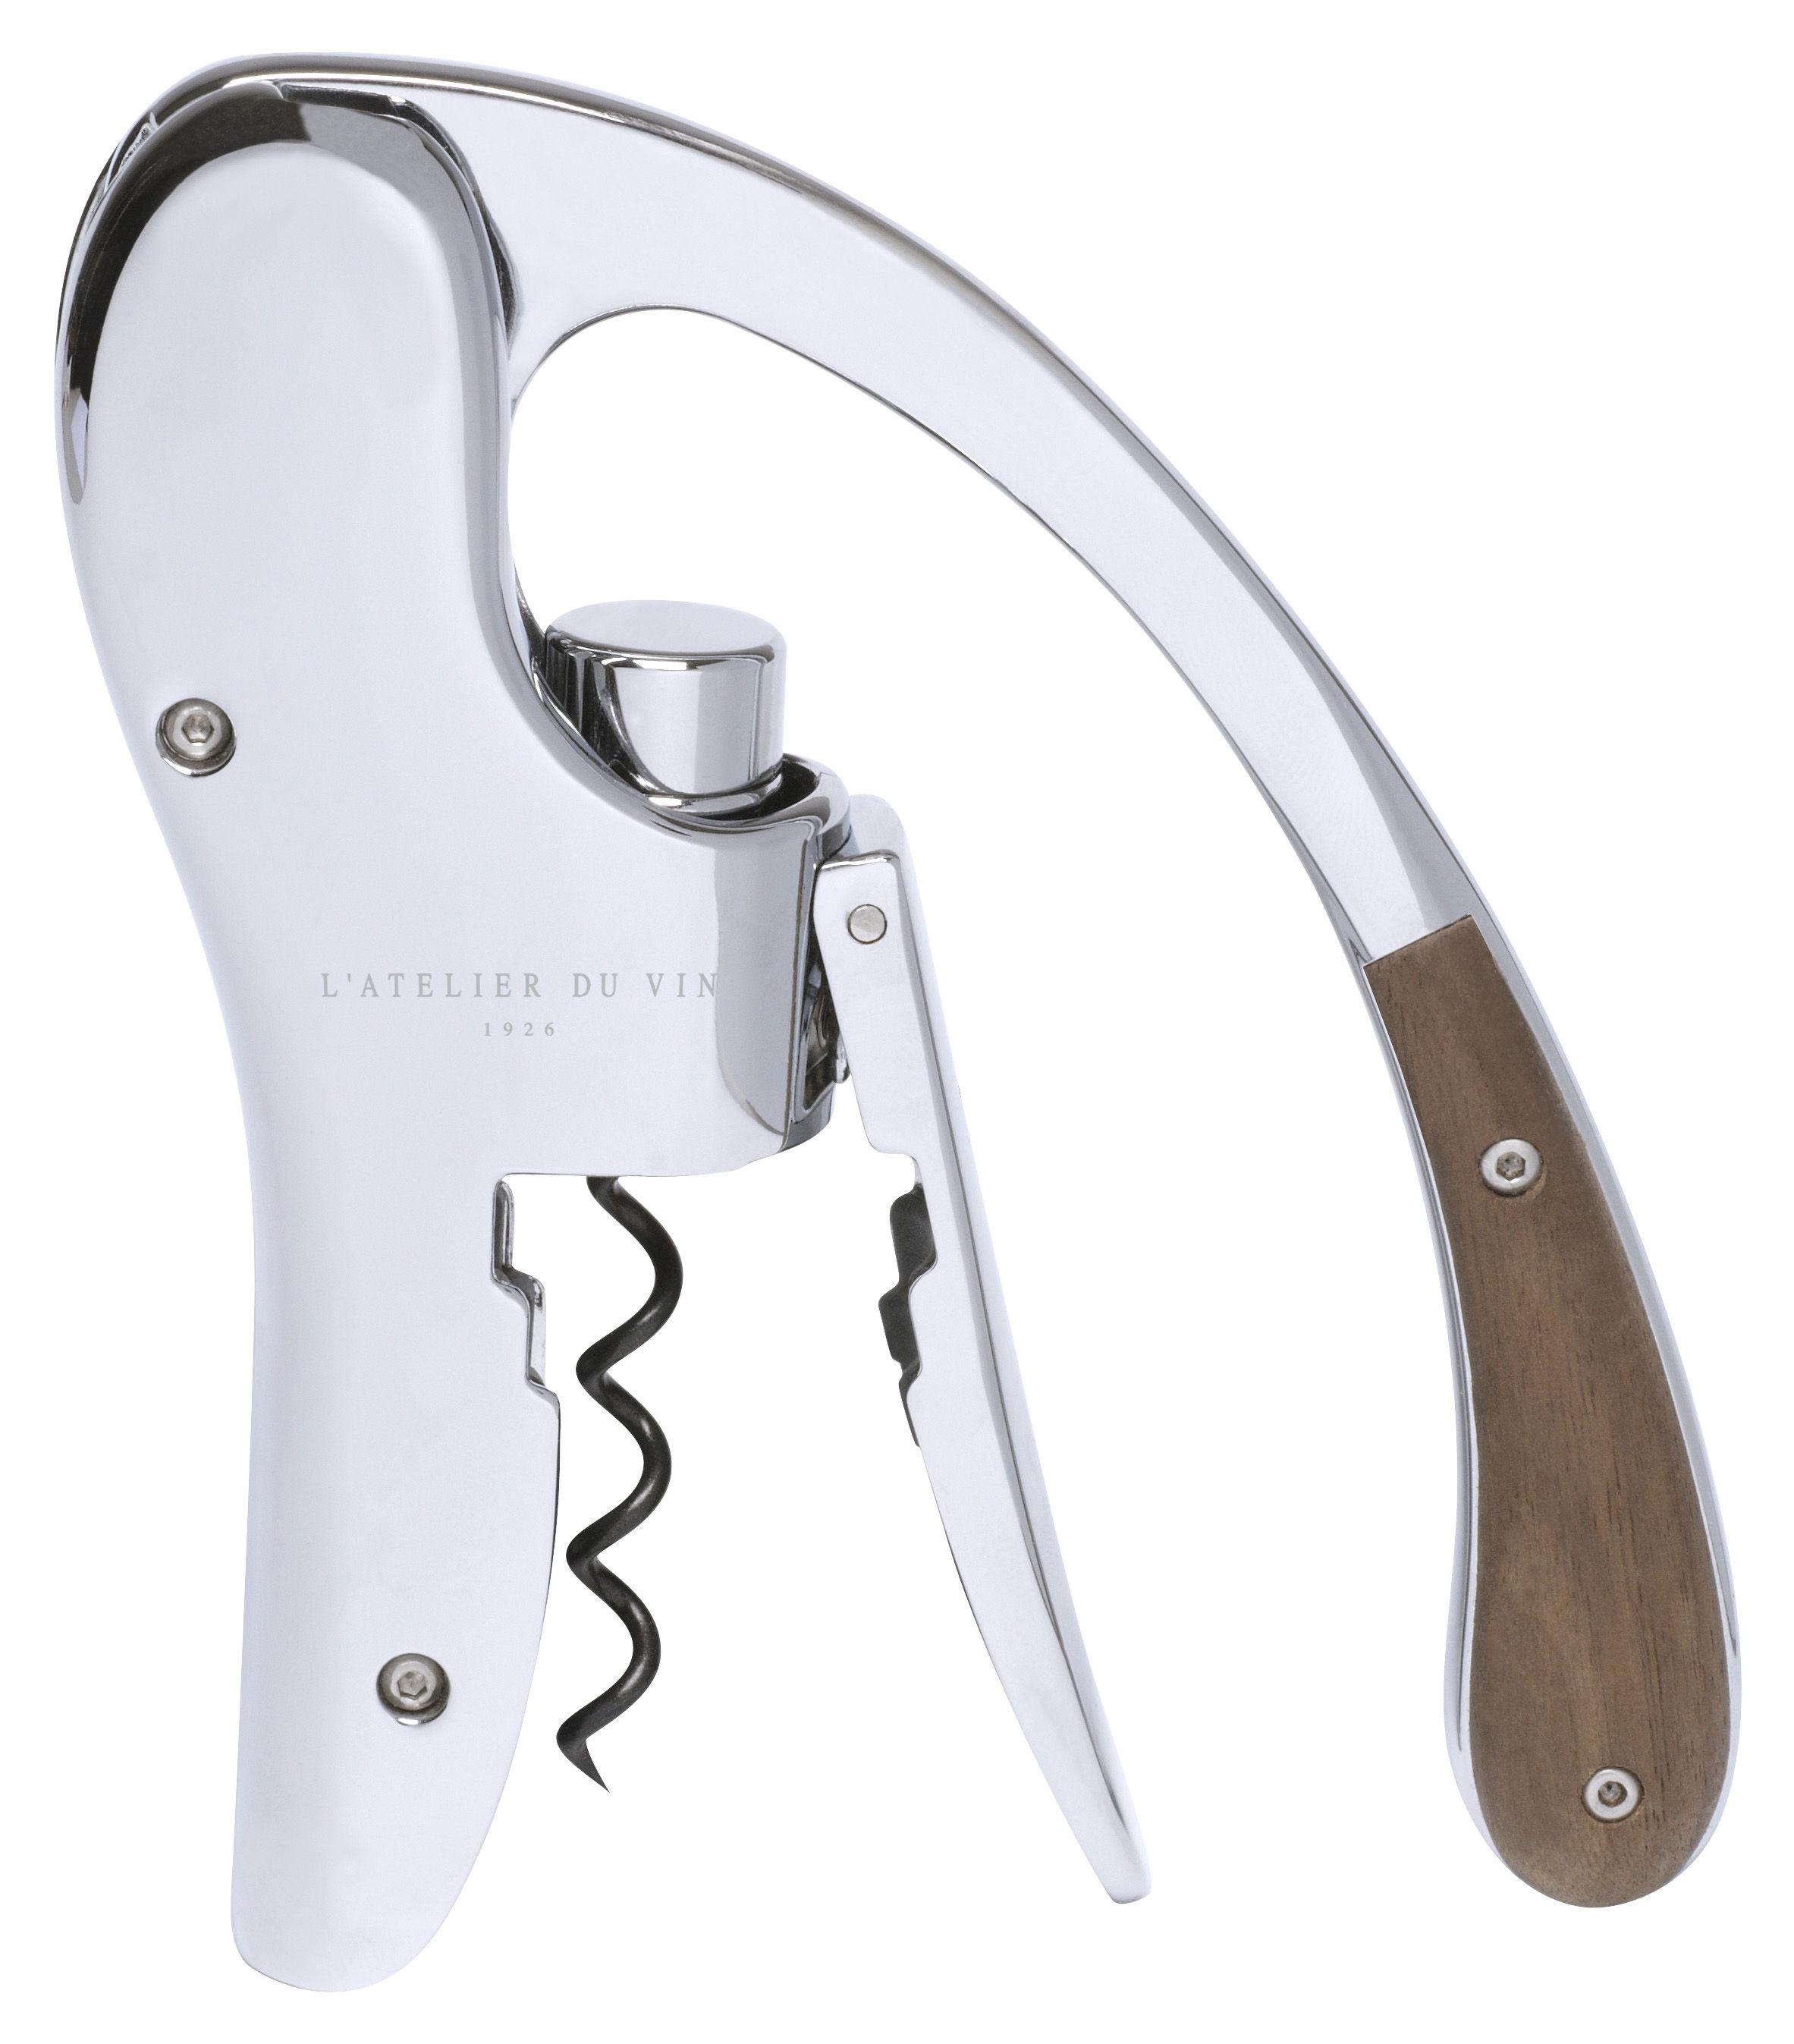 Tableware - Wine Accessories - Oeno Box Bottle opener - Winged lever corkscrew by L'Atelier du Vin - Chromium & wood - Metal, Solid walnut